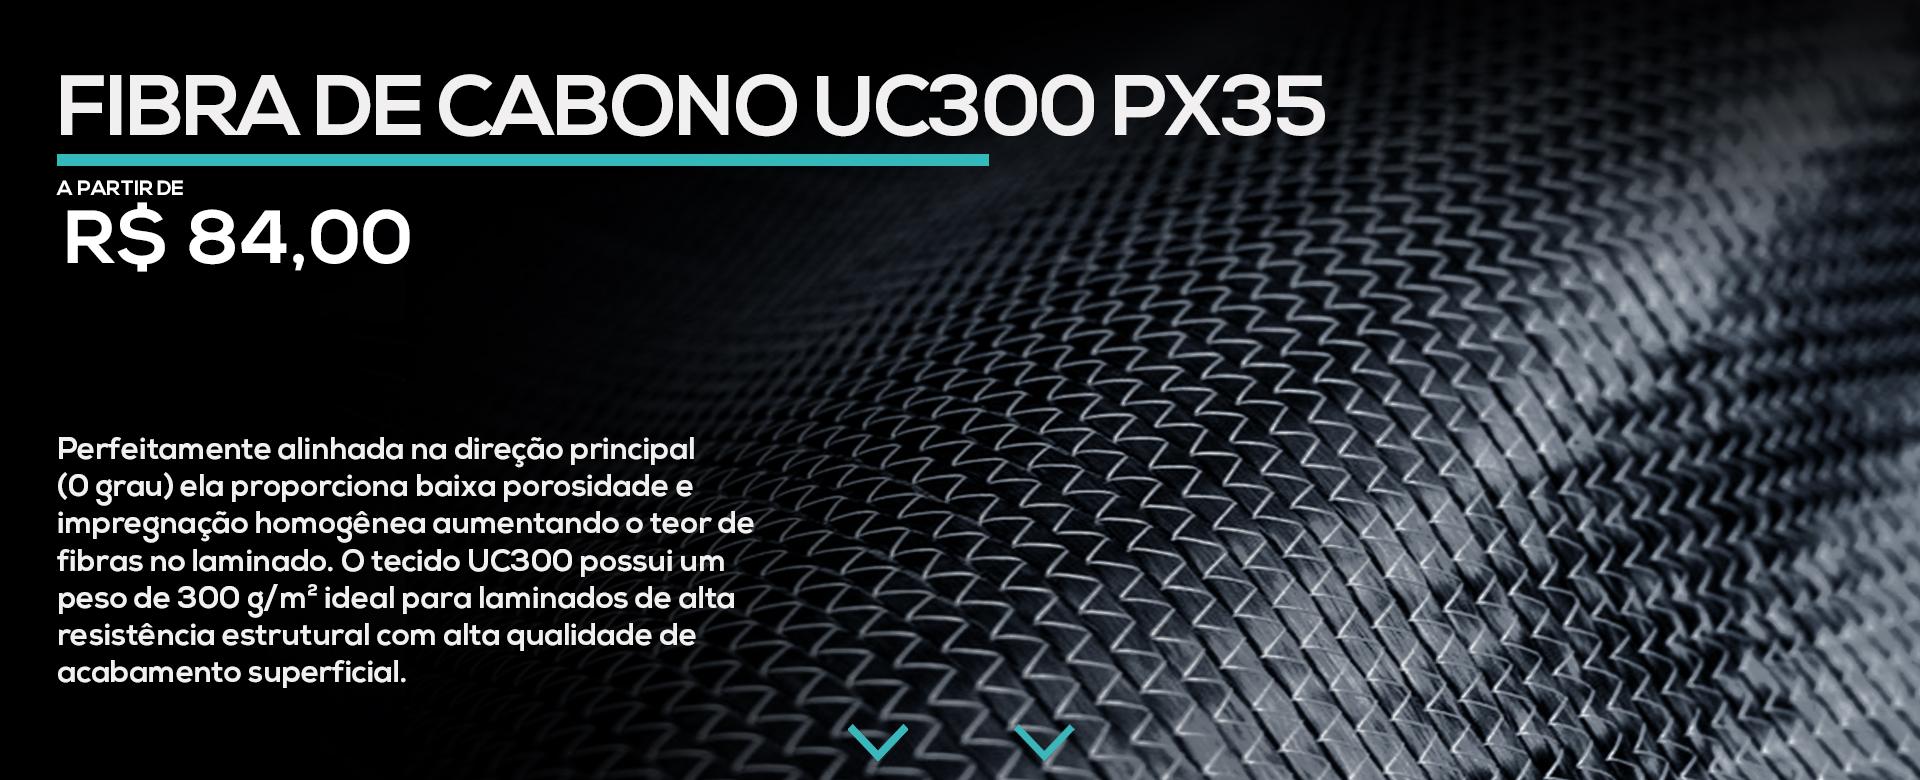 UC300 PX35